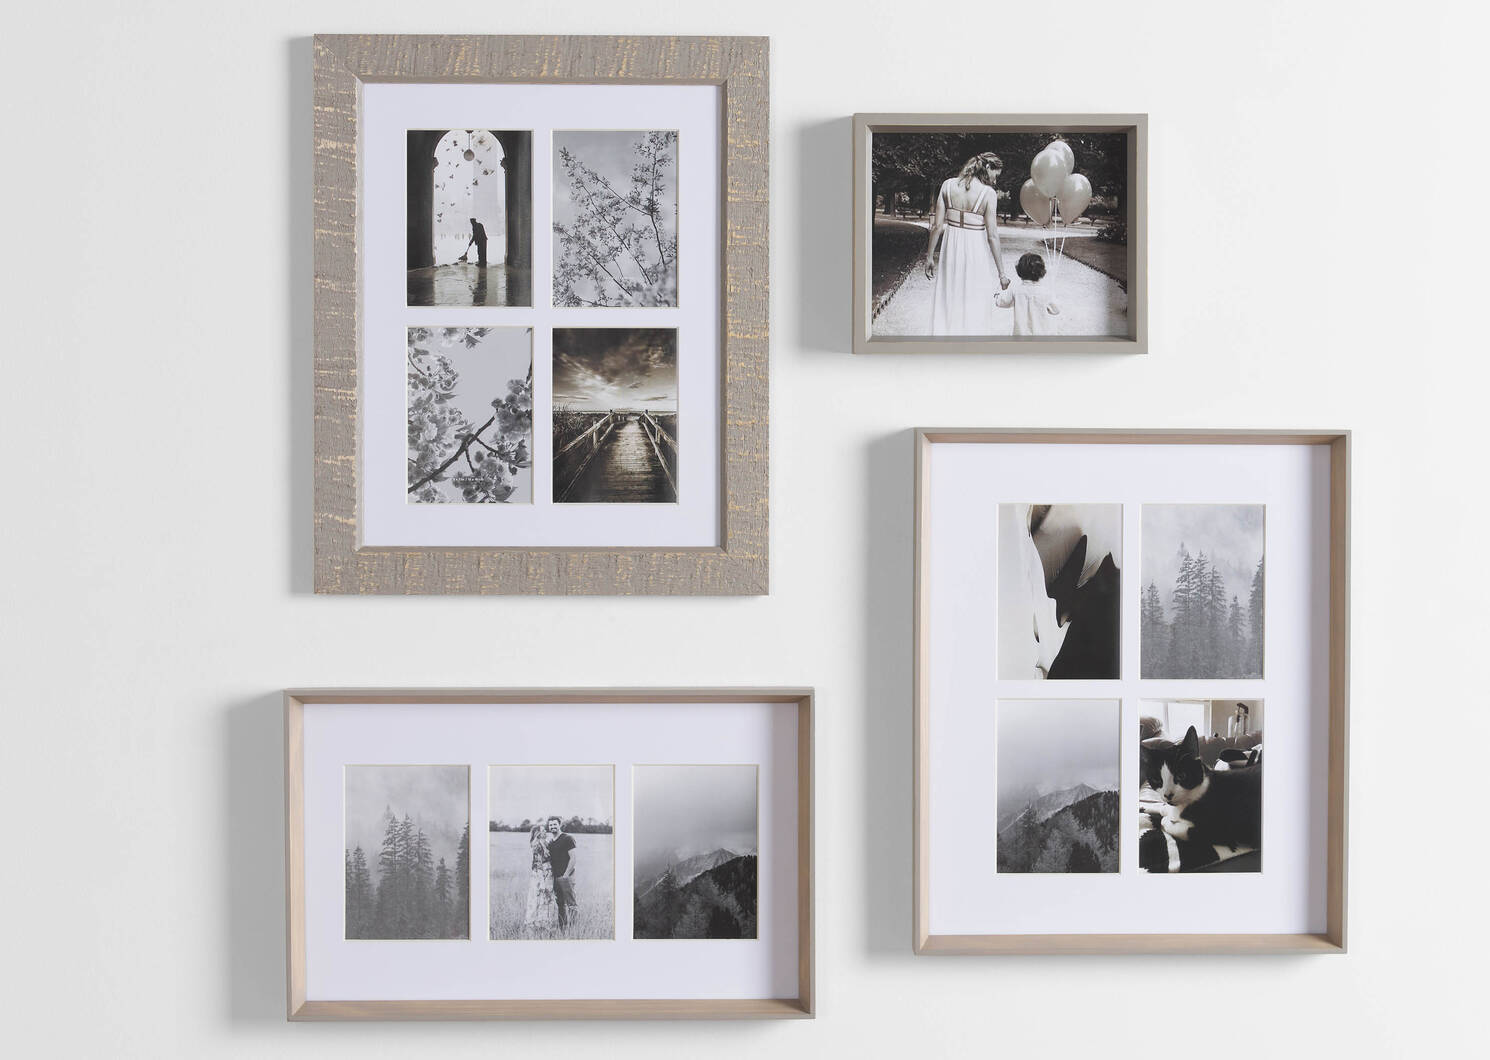 Keon Wall Frame 4-5x7 Grey